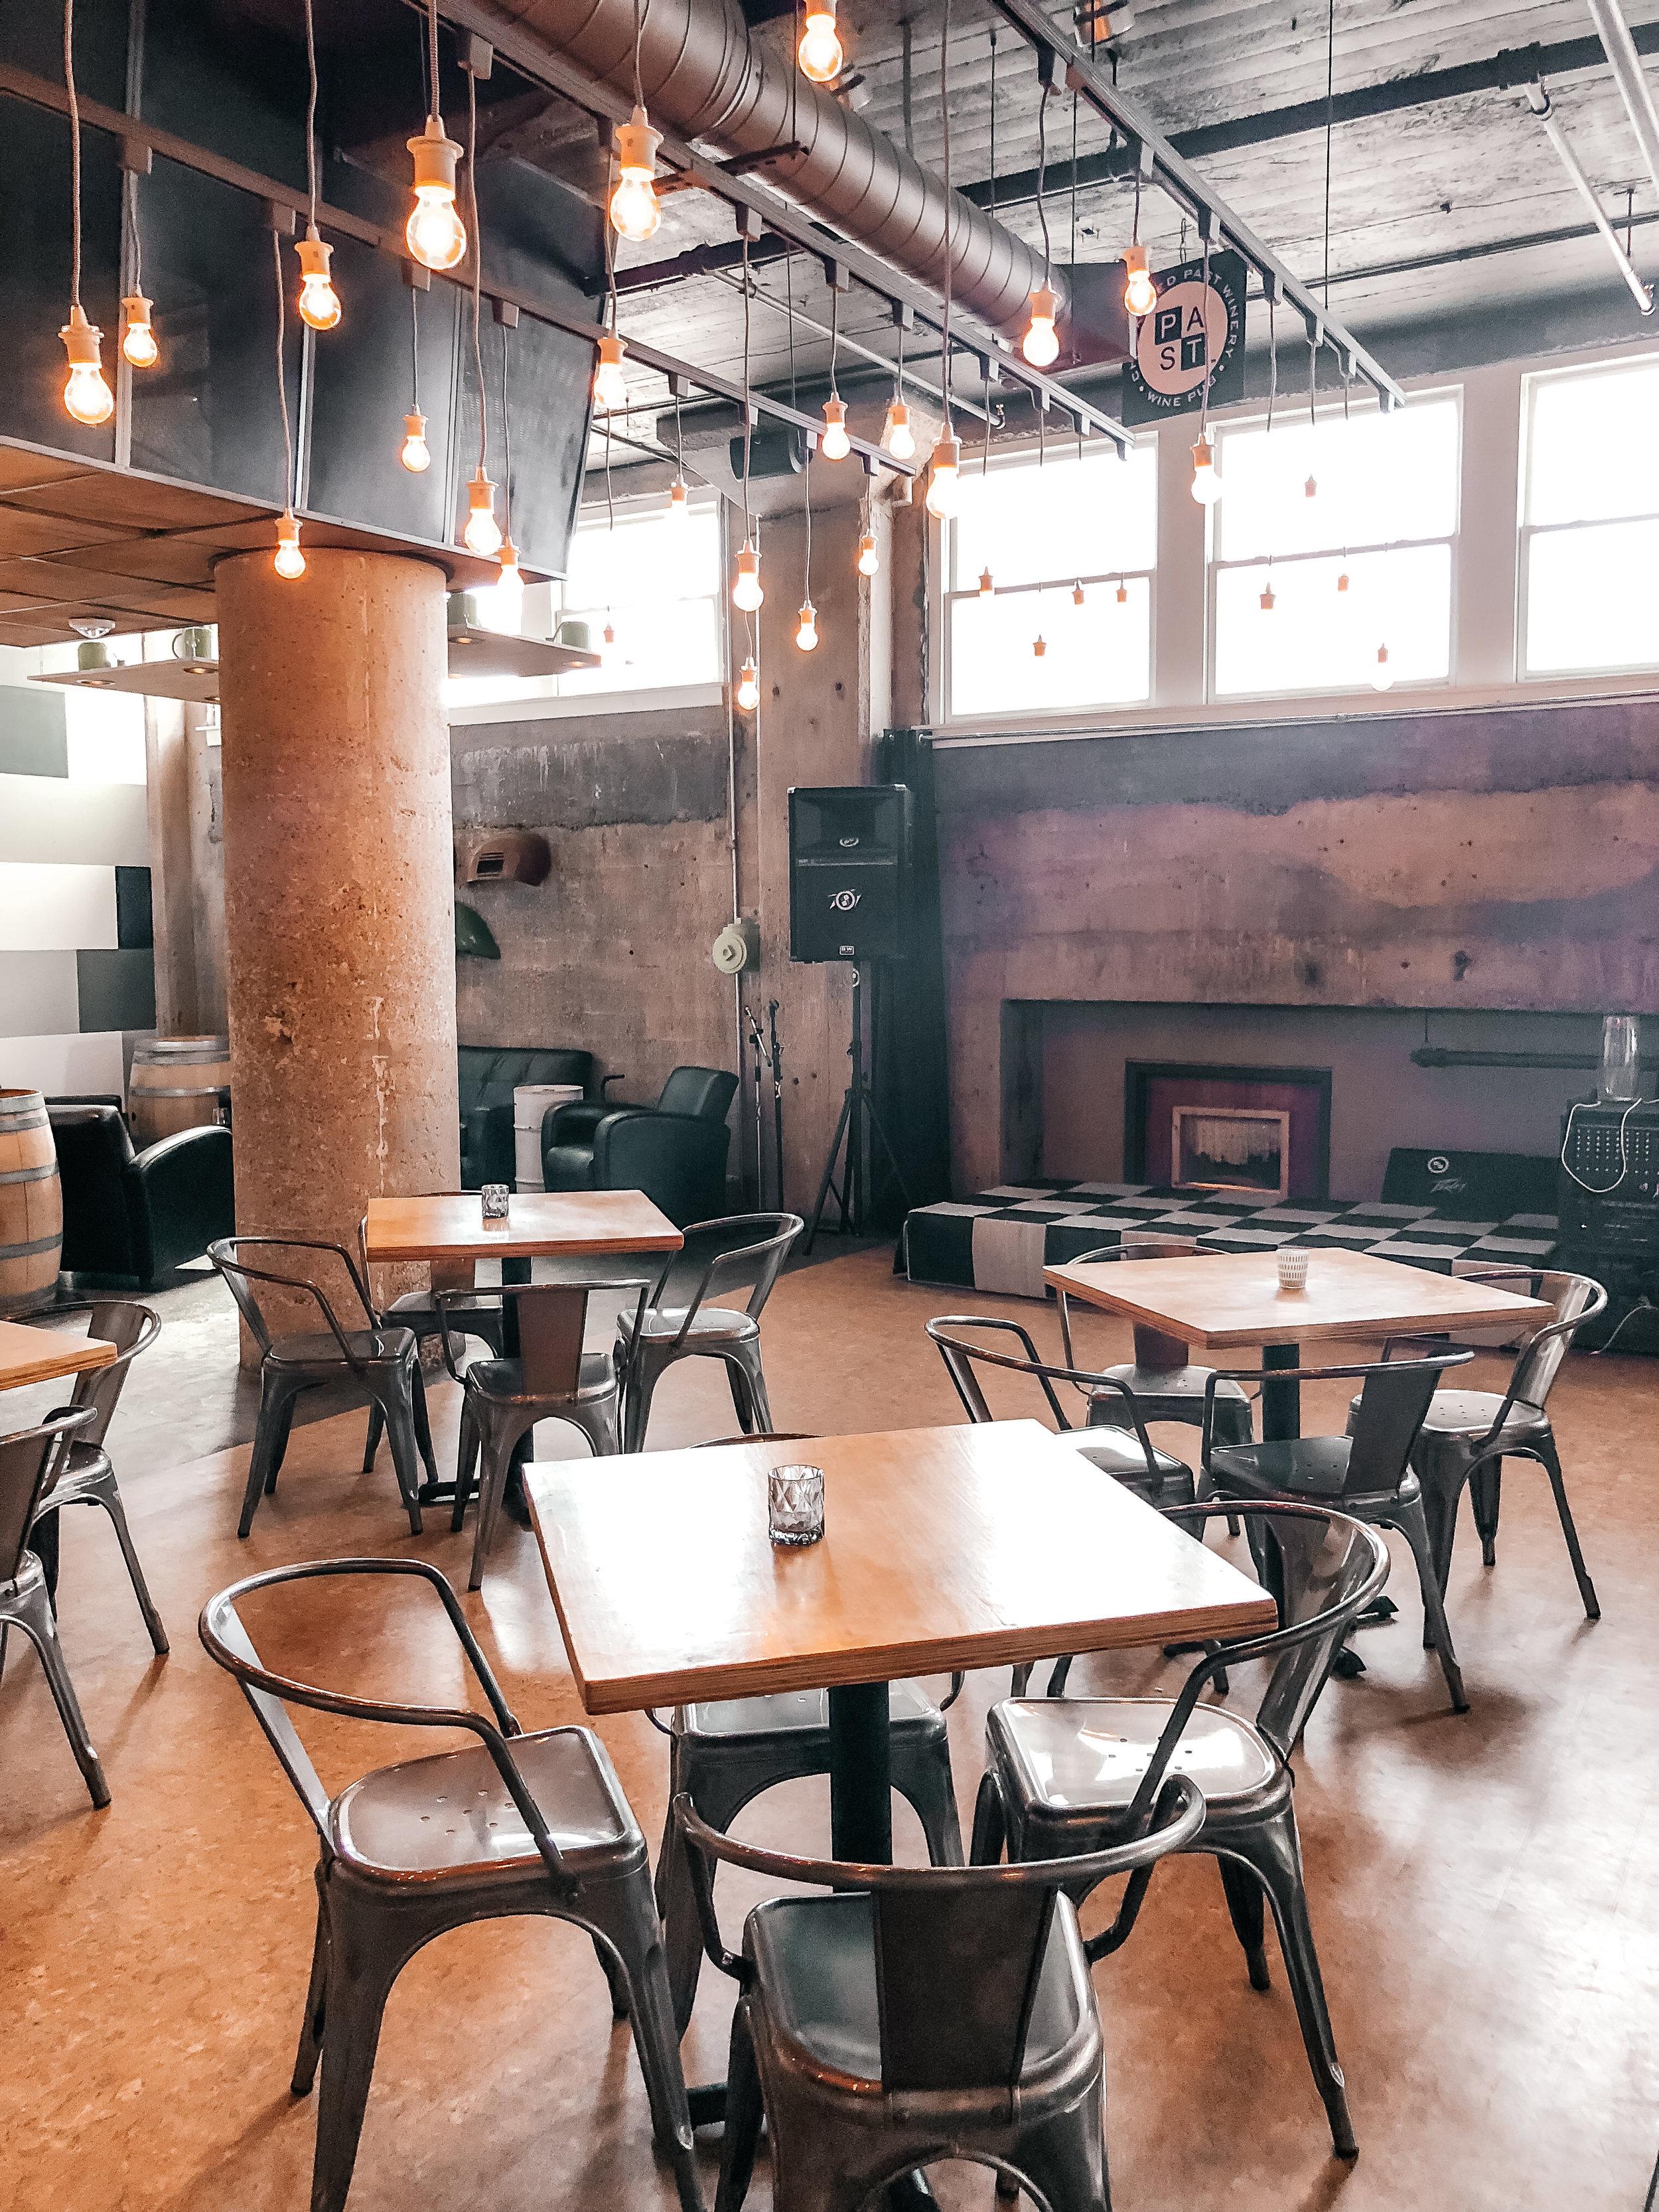 Checkered Past Winery in Dallas